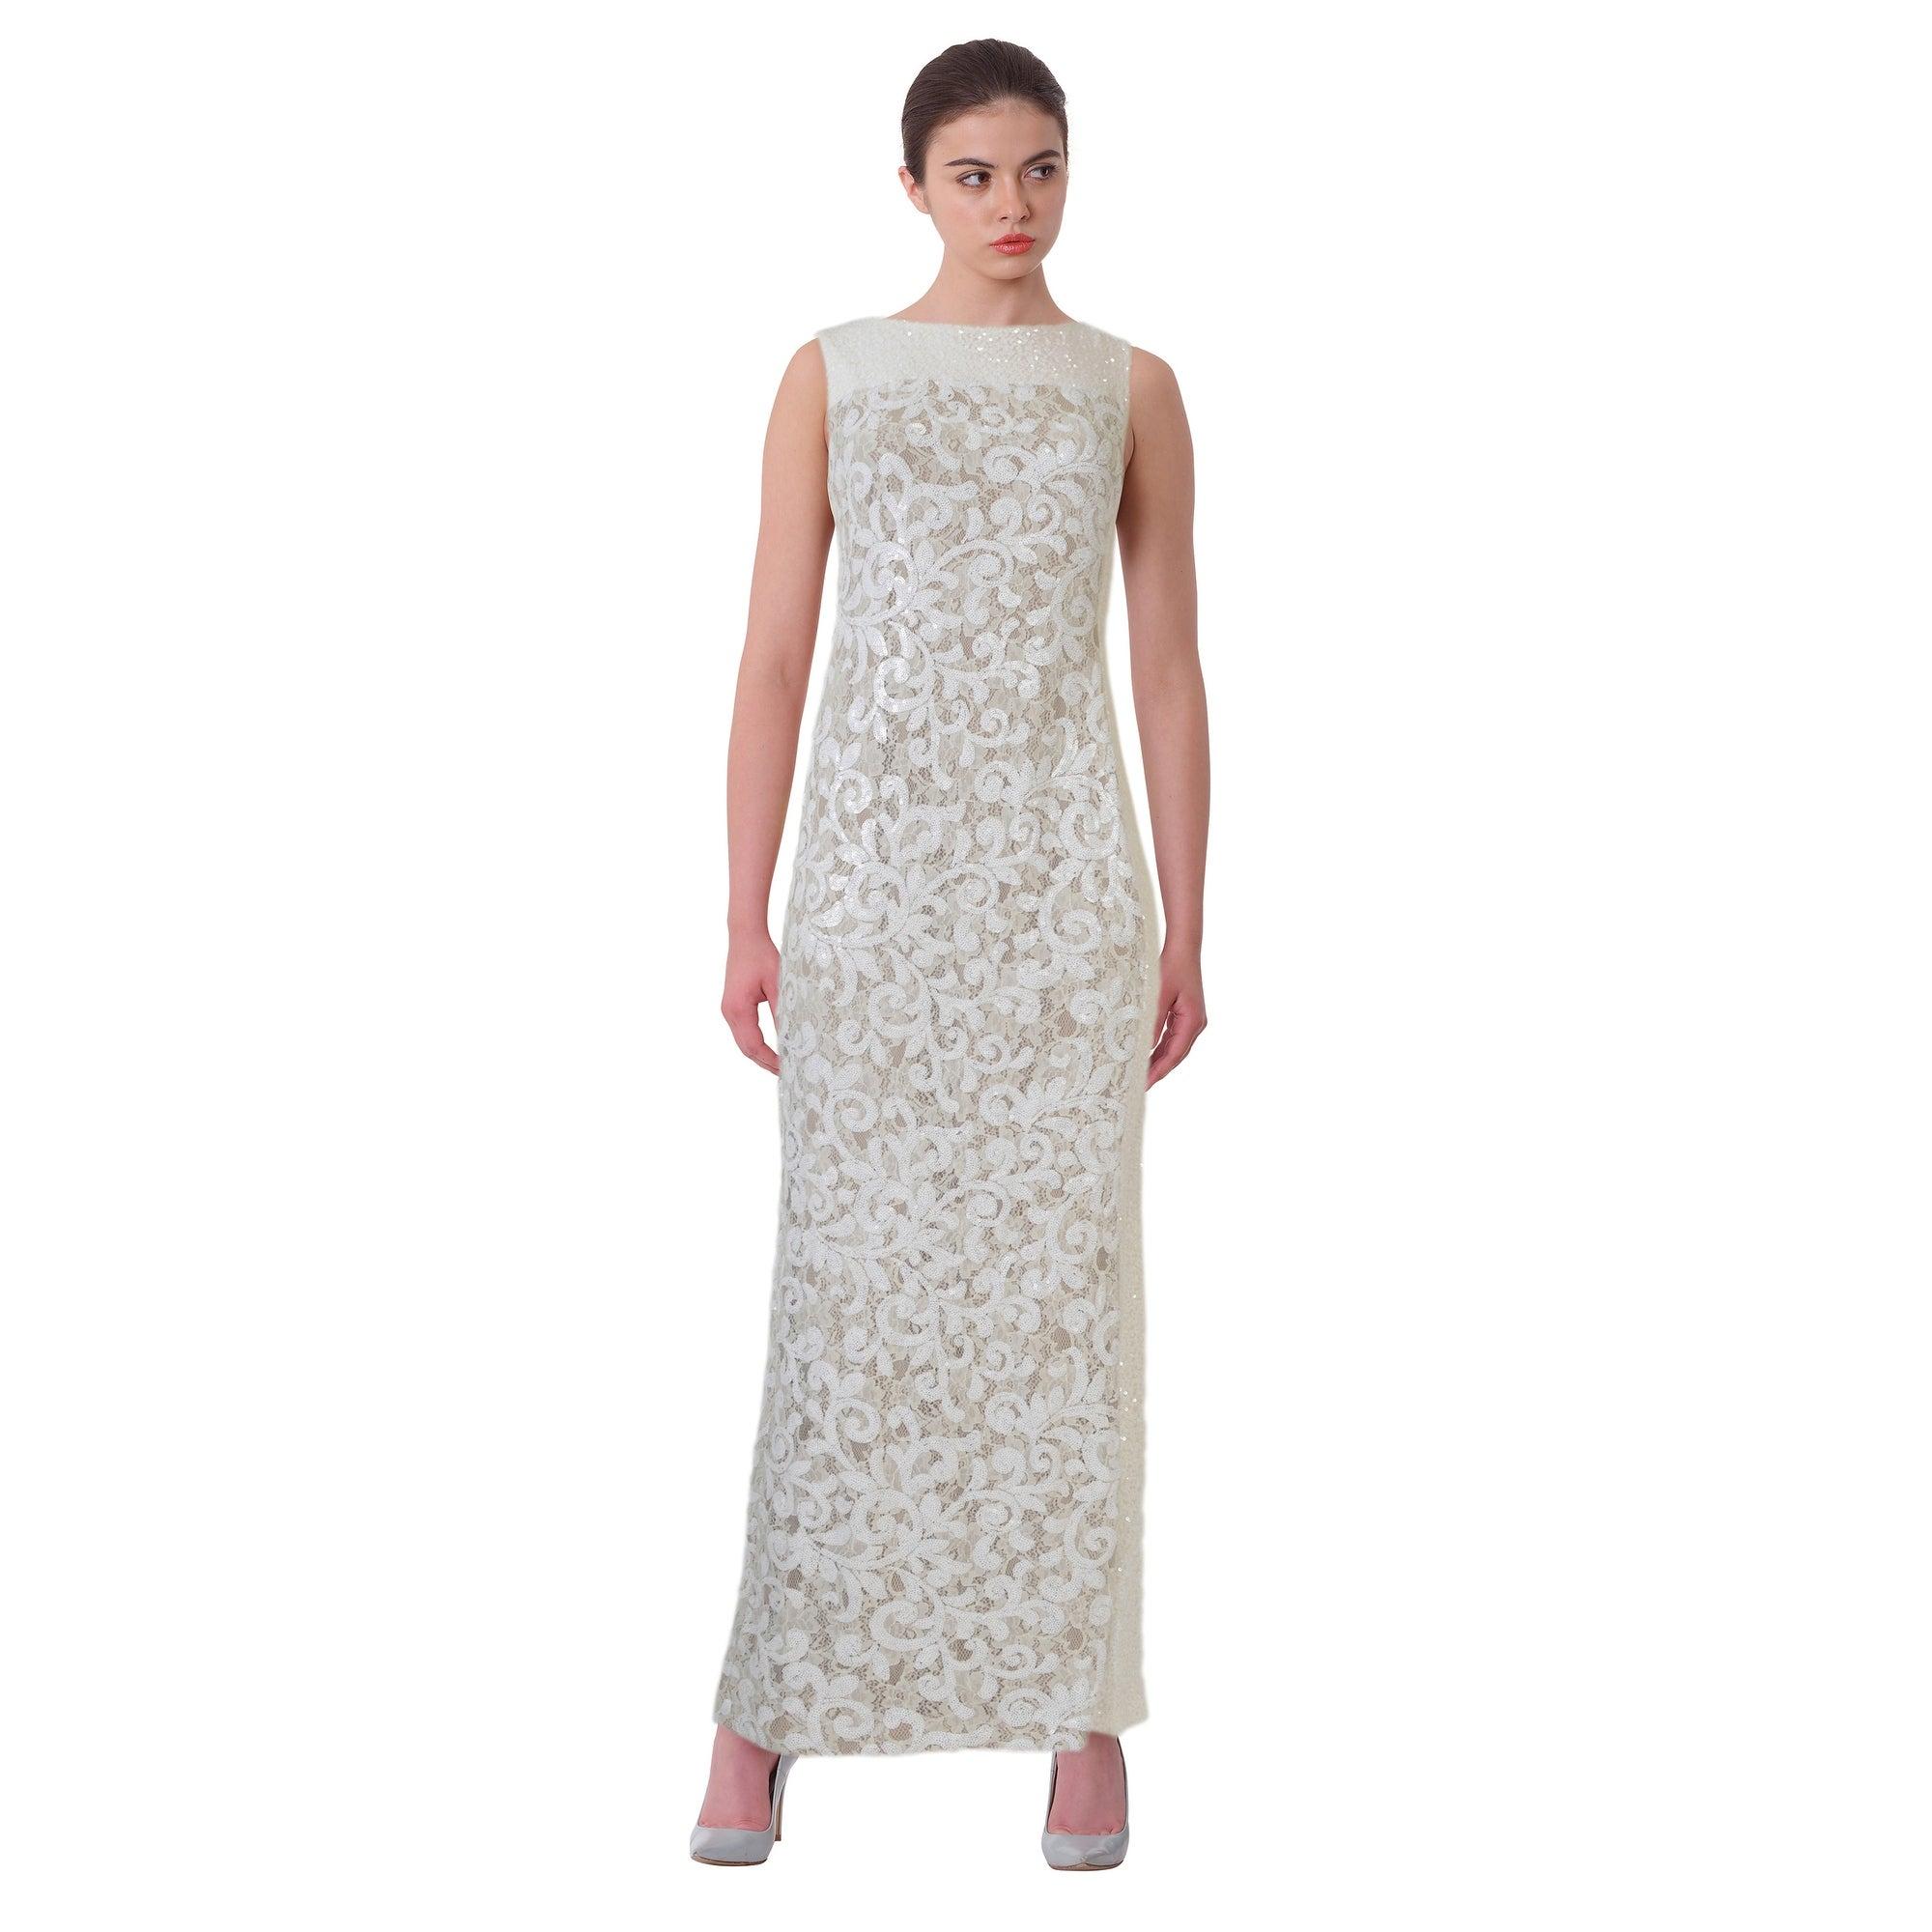 Shop Lauren Ralph Lauren Sequined Floral Lace Sleeveless Evening ...